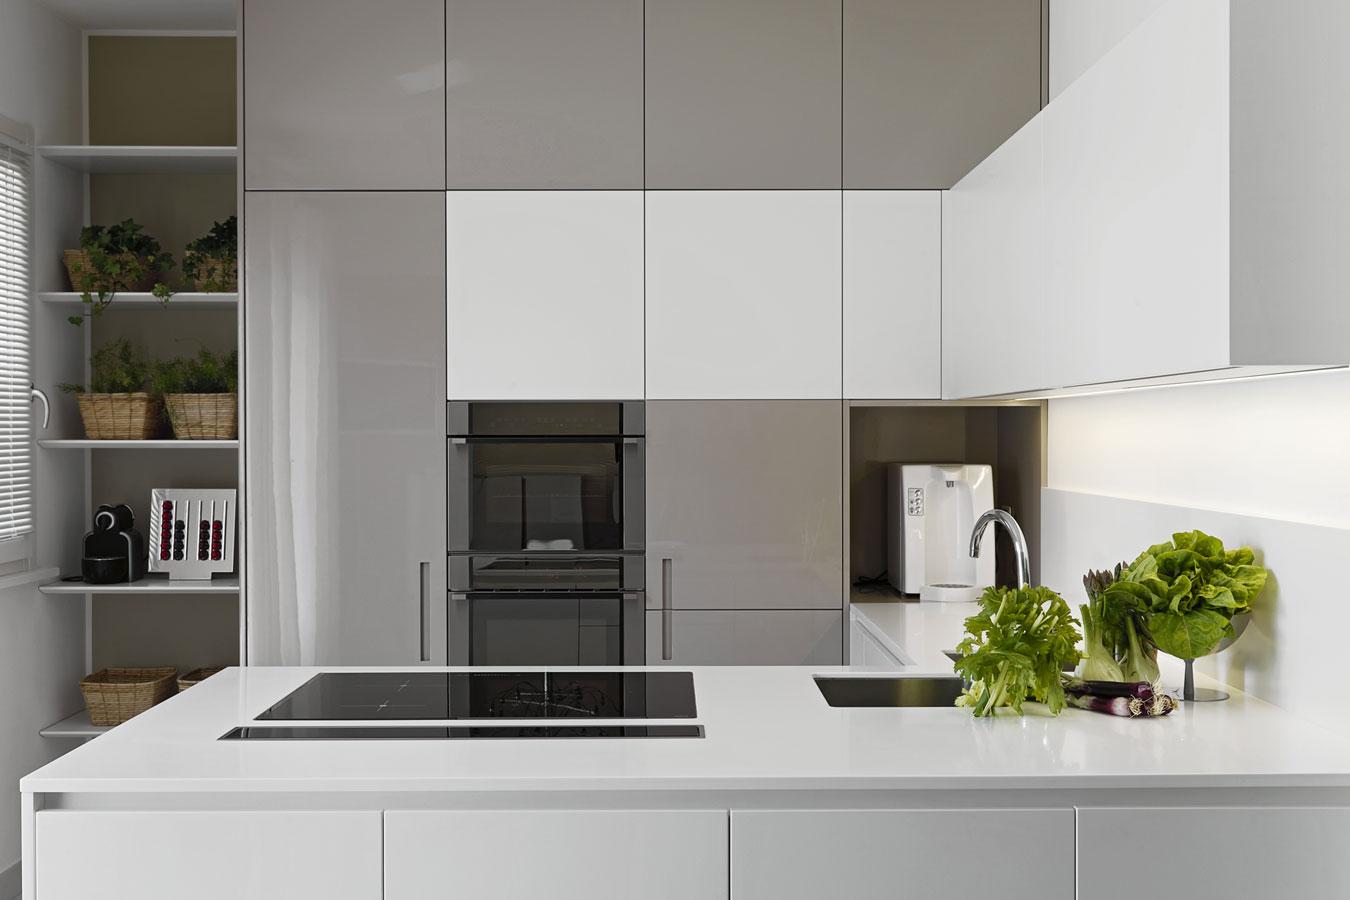 Moderne keukens idee n inspiratie - Fotos van moderne keuken ...